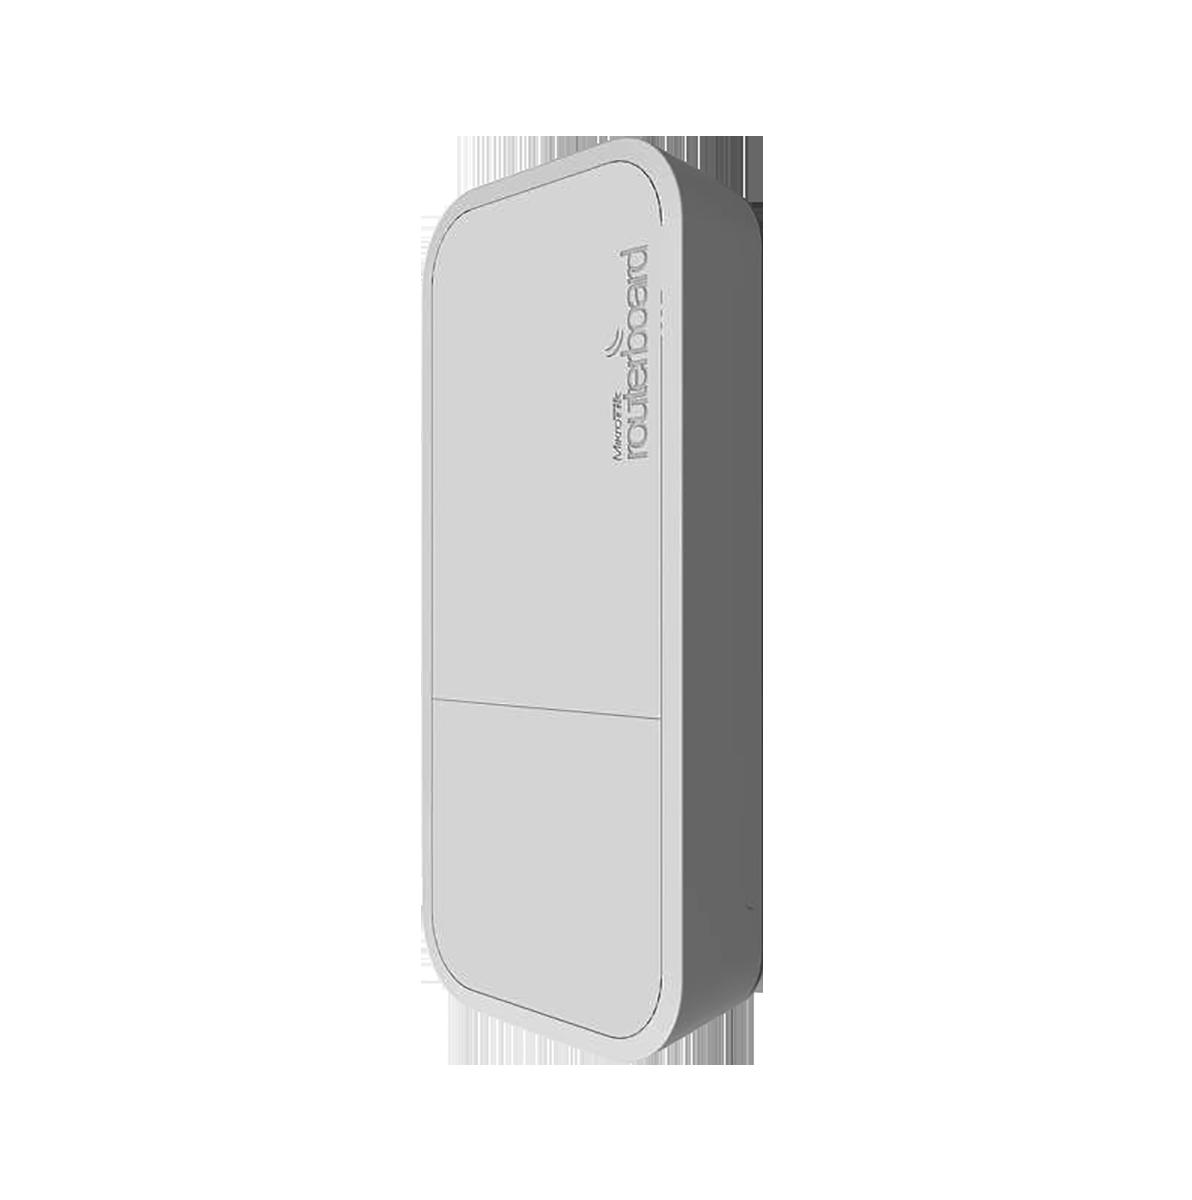 Mikrotik RouterBoard wAP LTE kit-US Small weatherproof